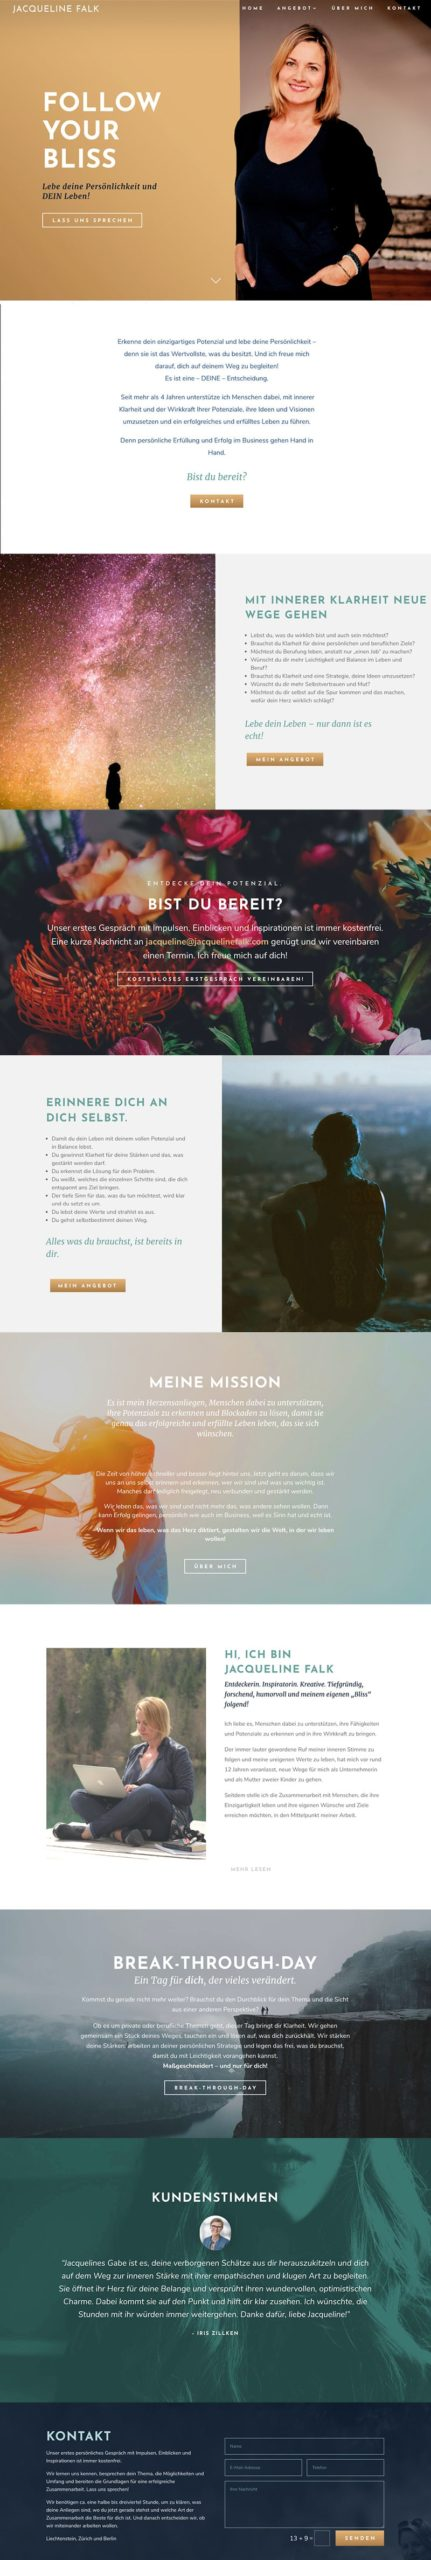 Jacqueline Falk Website-Branding